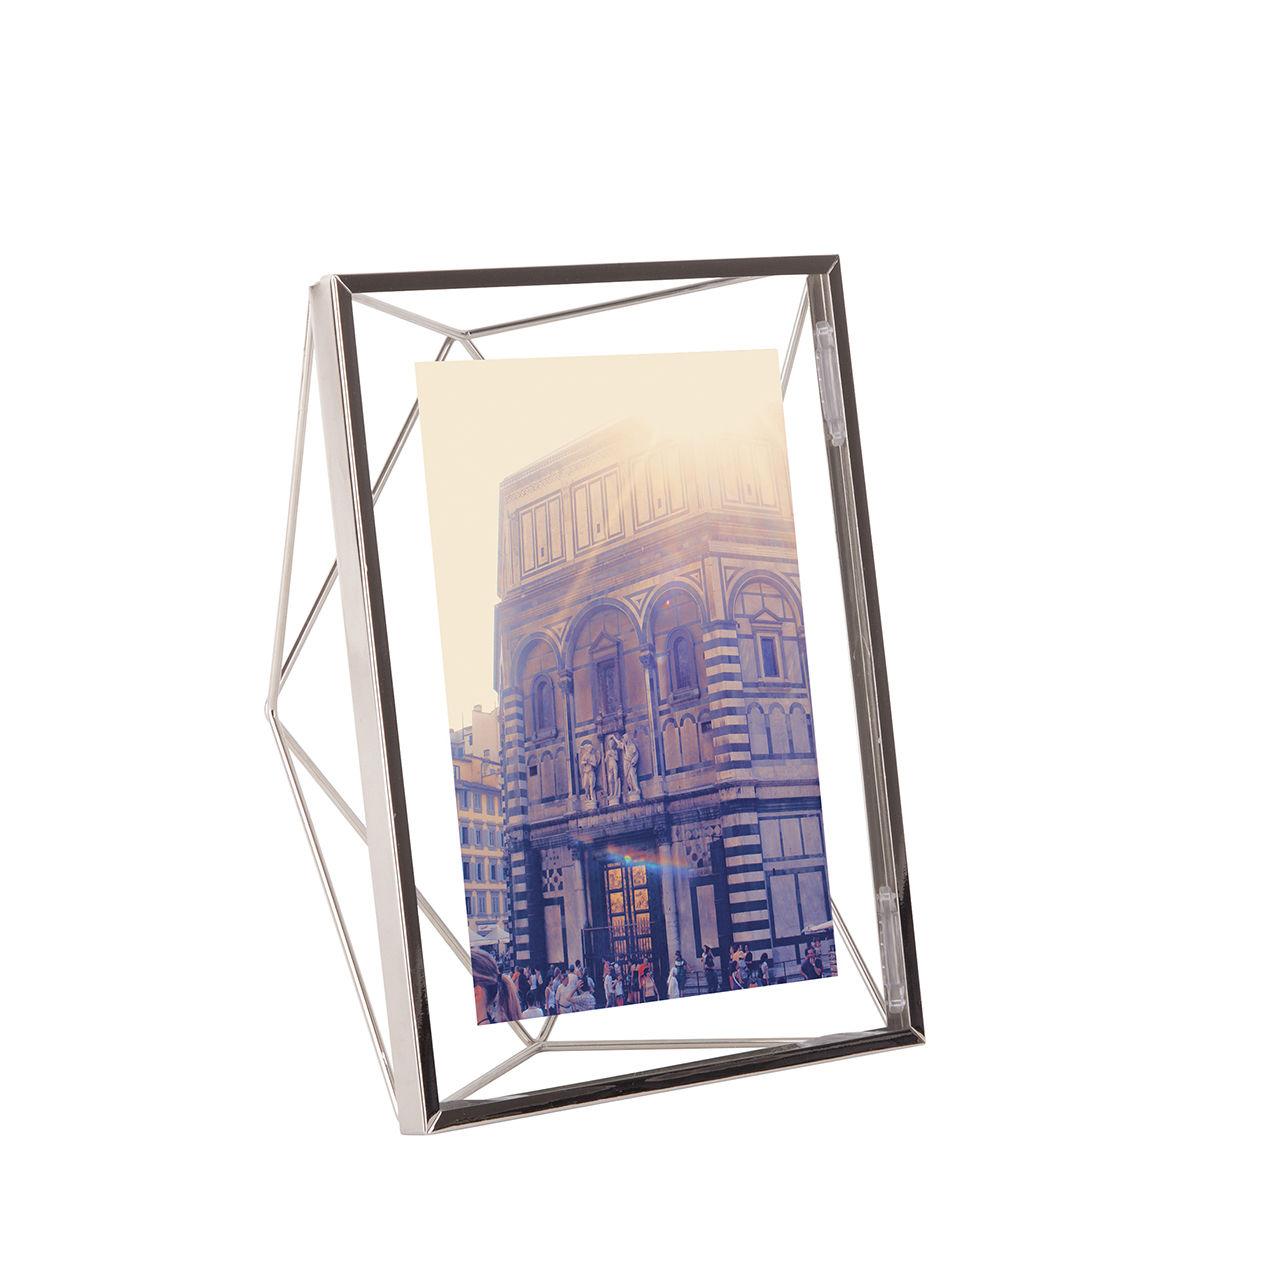 Prisma fotolijst Umbra 18x23cm chroom